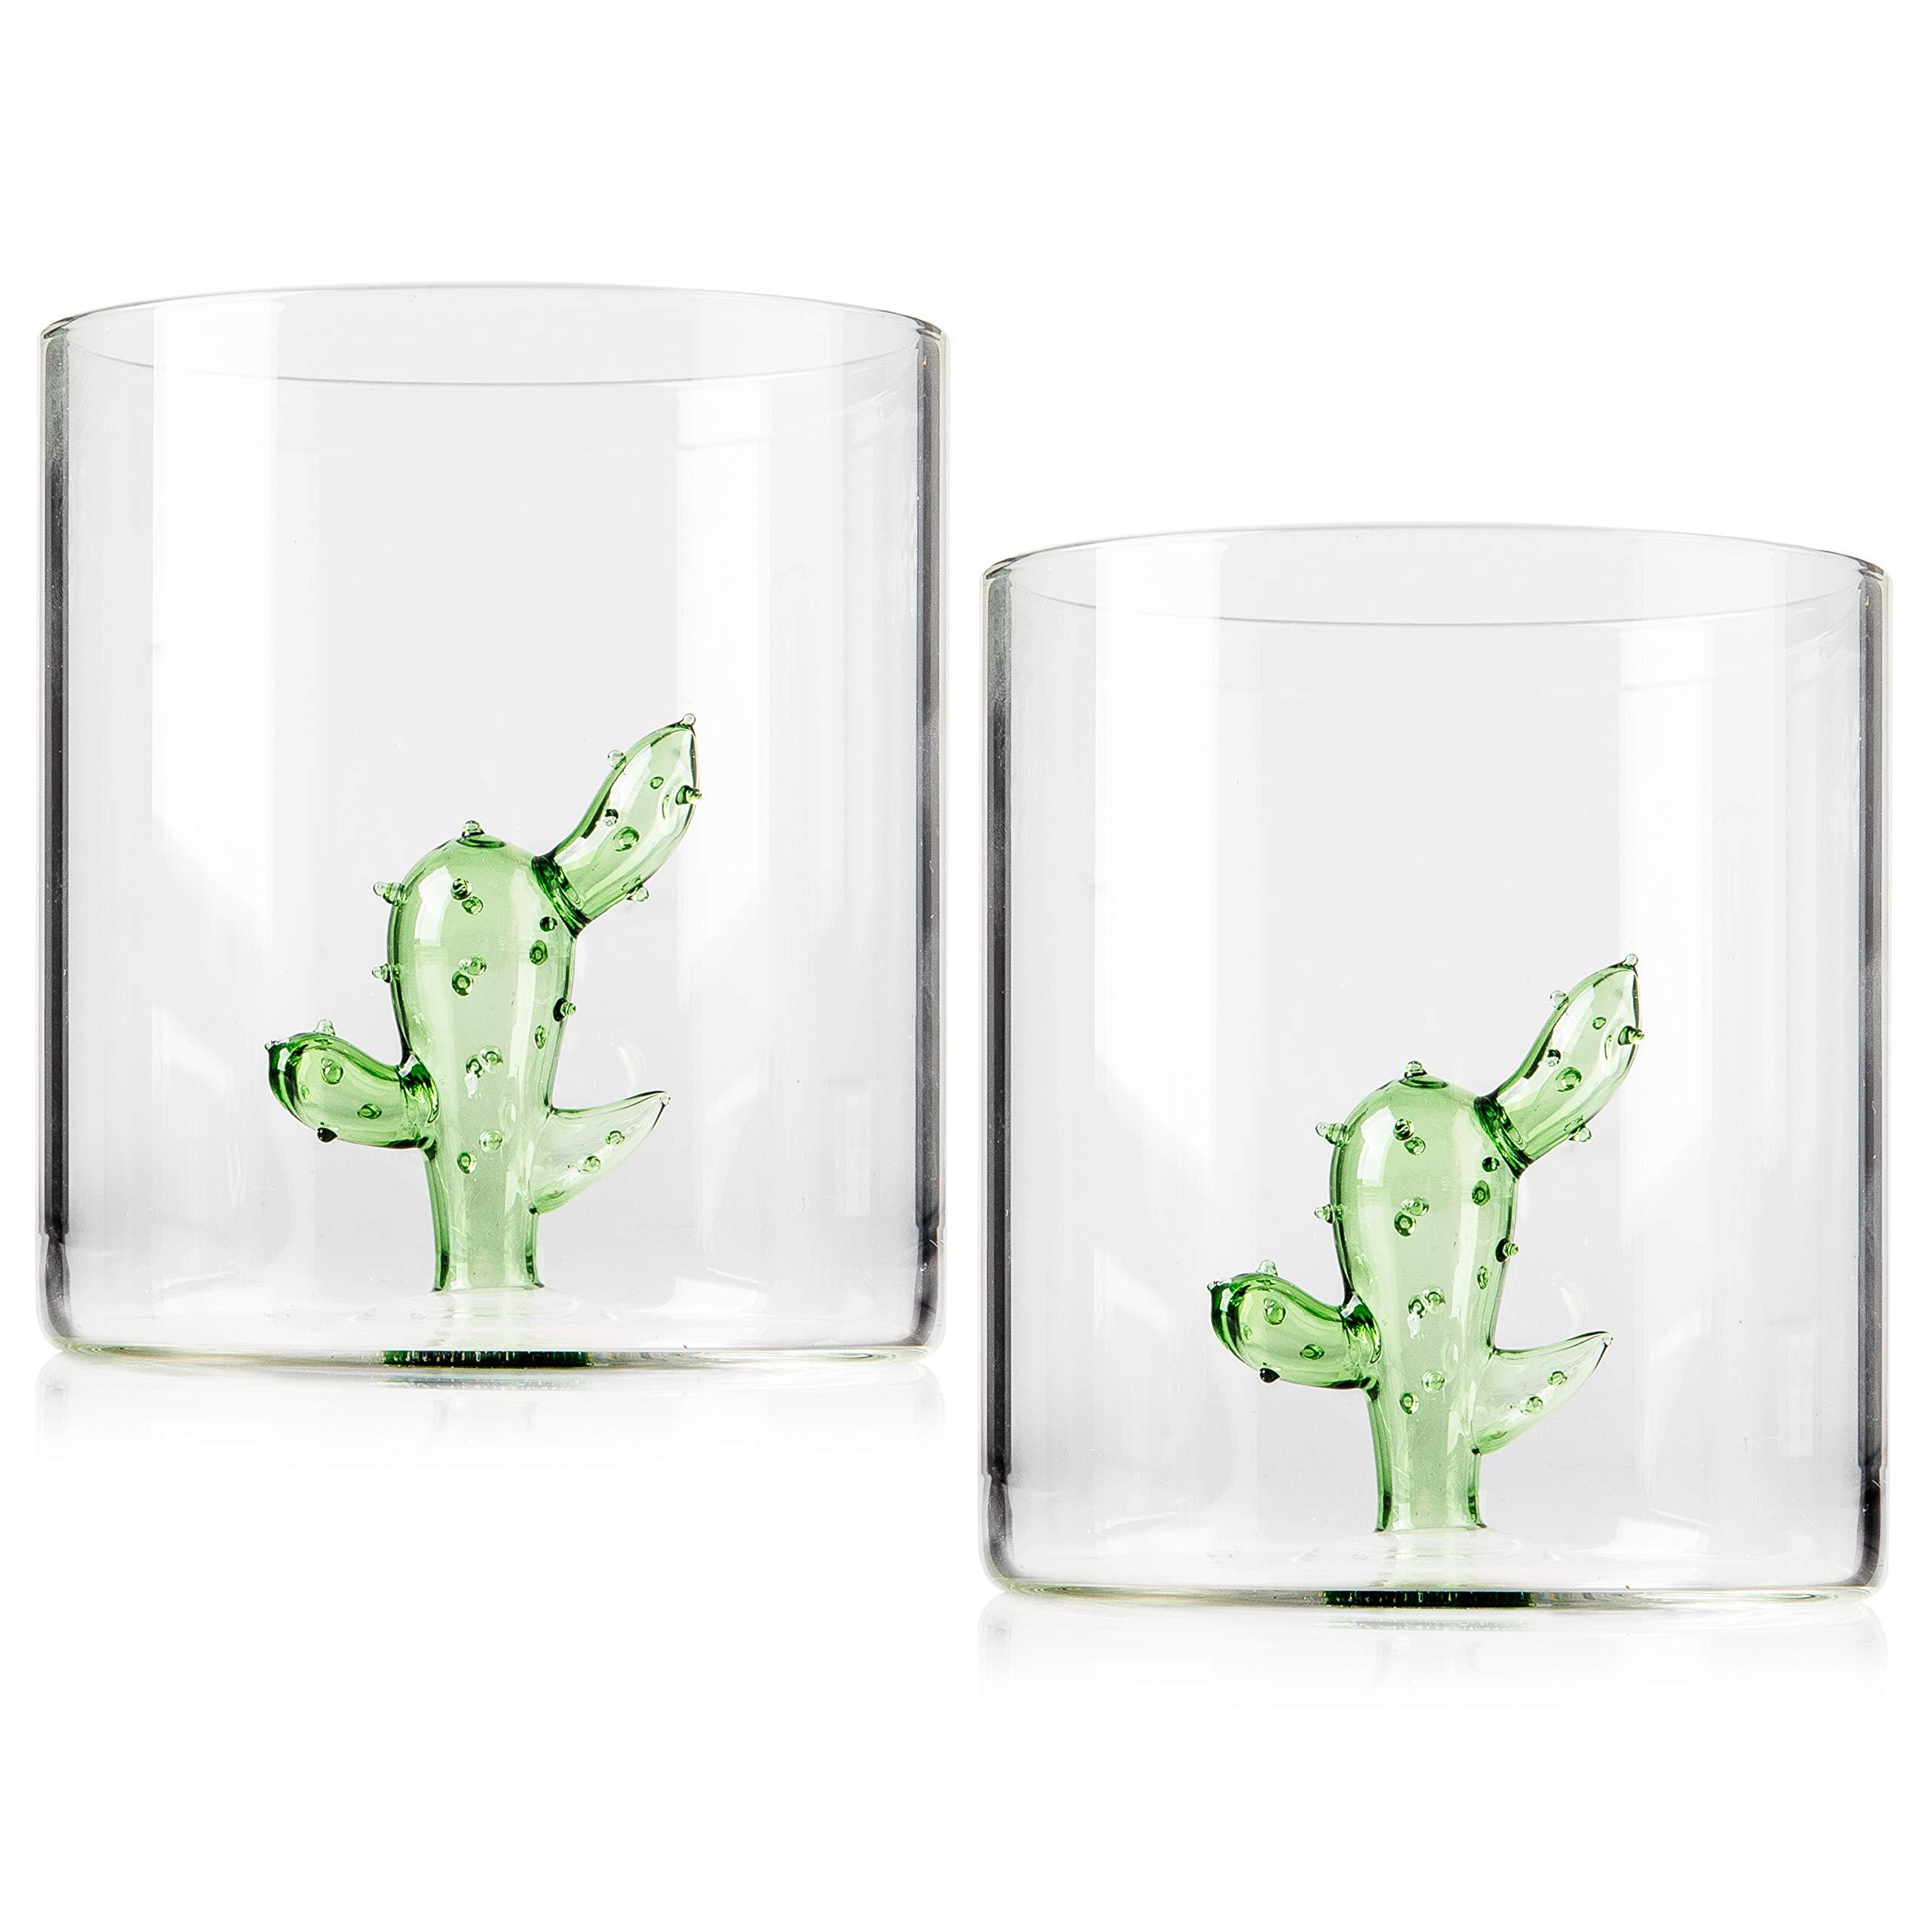 Margarita Glasses - Set of 2 - Cactus Margarita Glass | Lead-Free Handblown Seamless Glass, Large 16oz - Stemless Low Ball Cocktail Tumblers - Tequila Tasting Glasses.